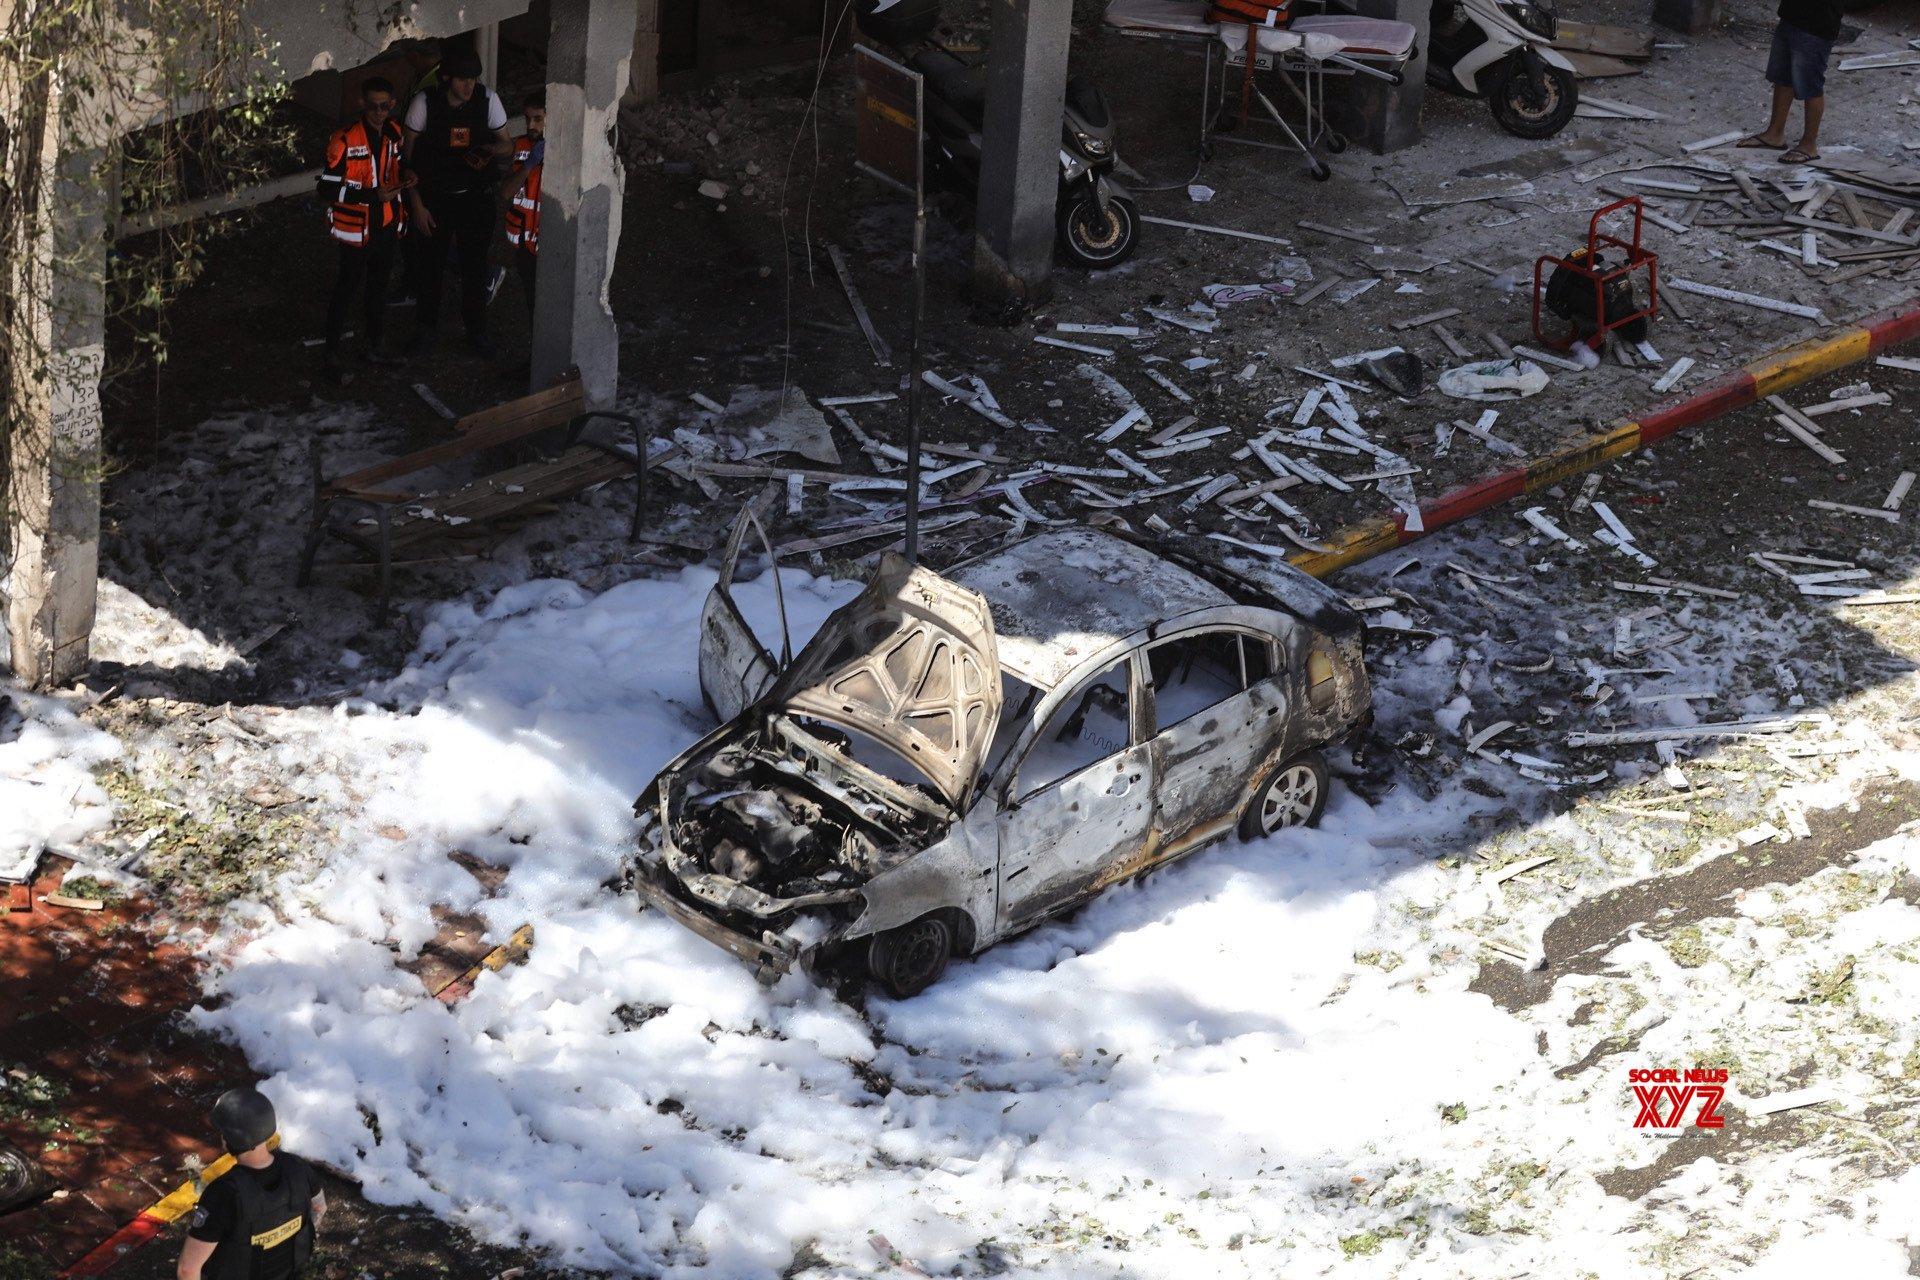 Crisis in Gaza political: Palestinian PM